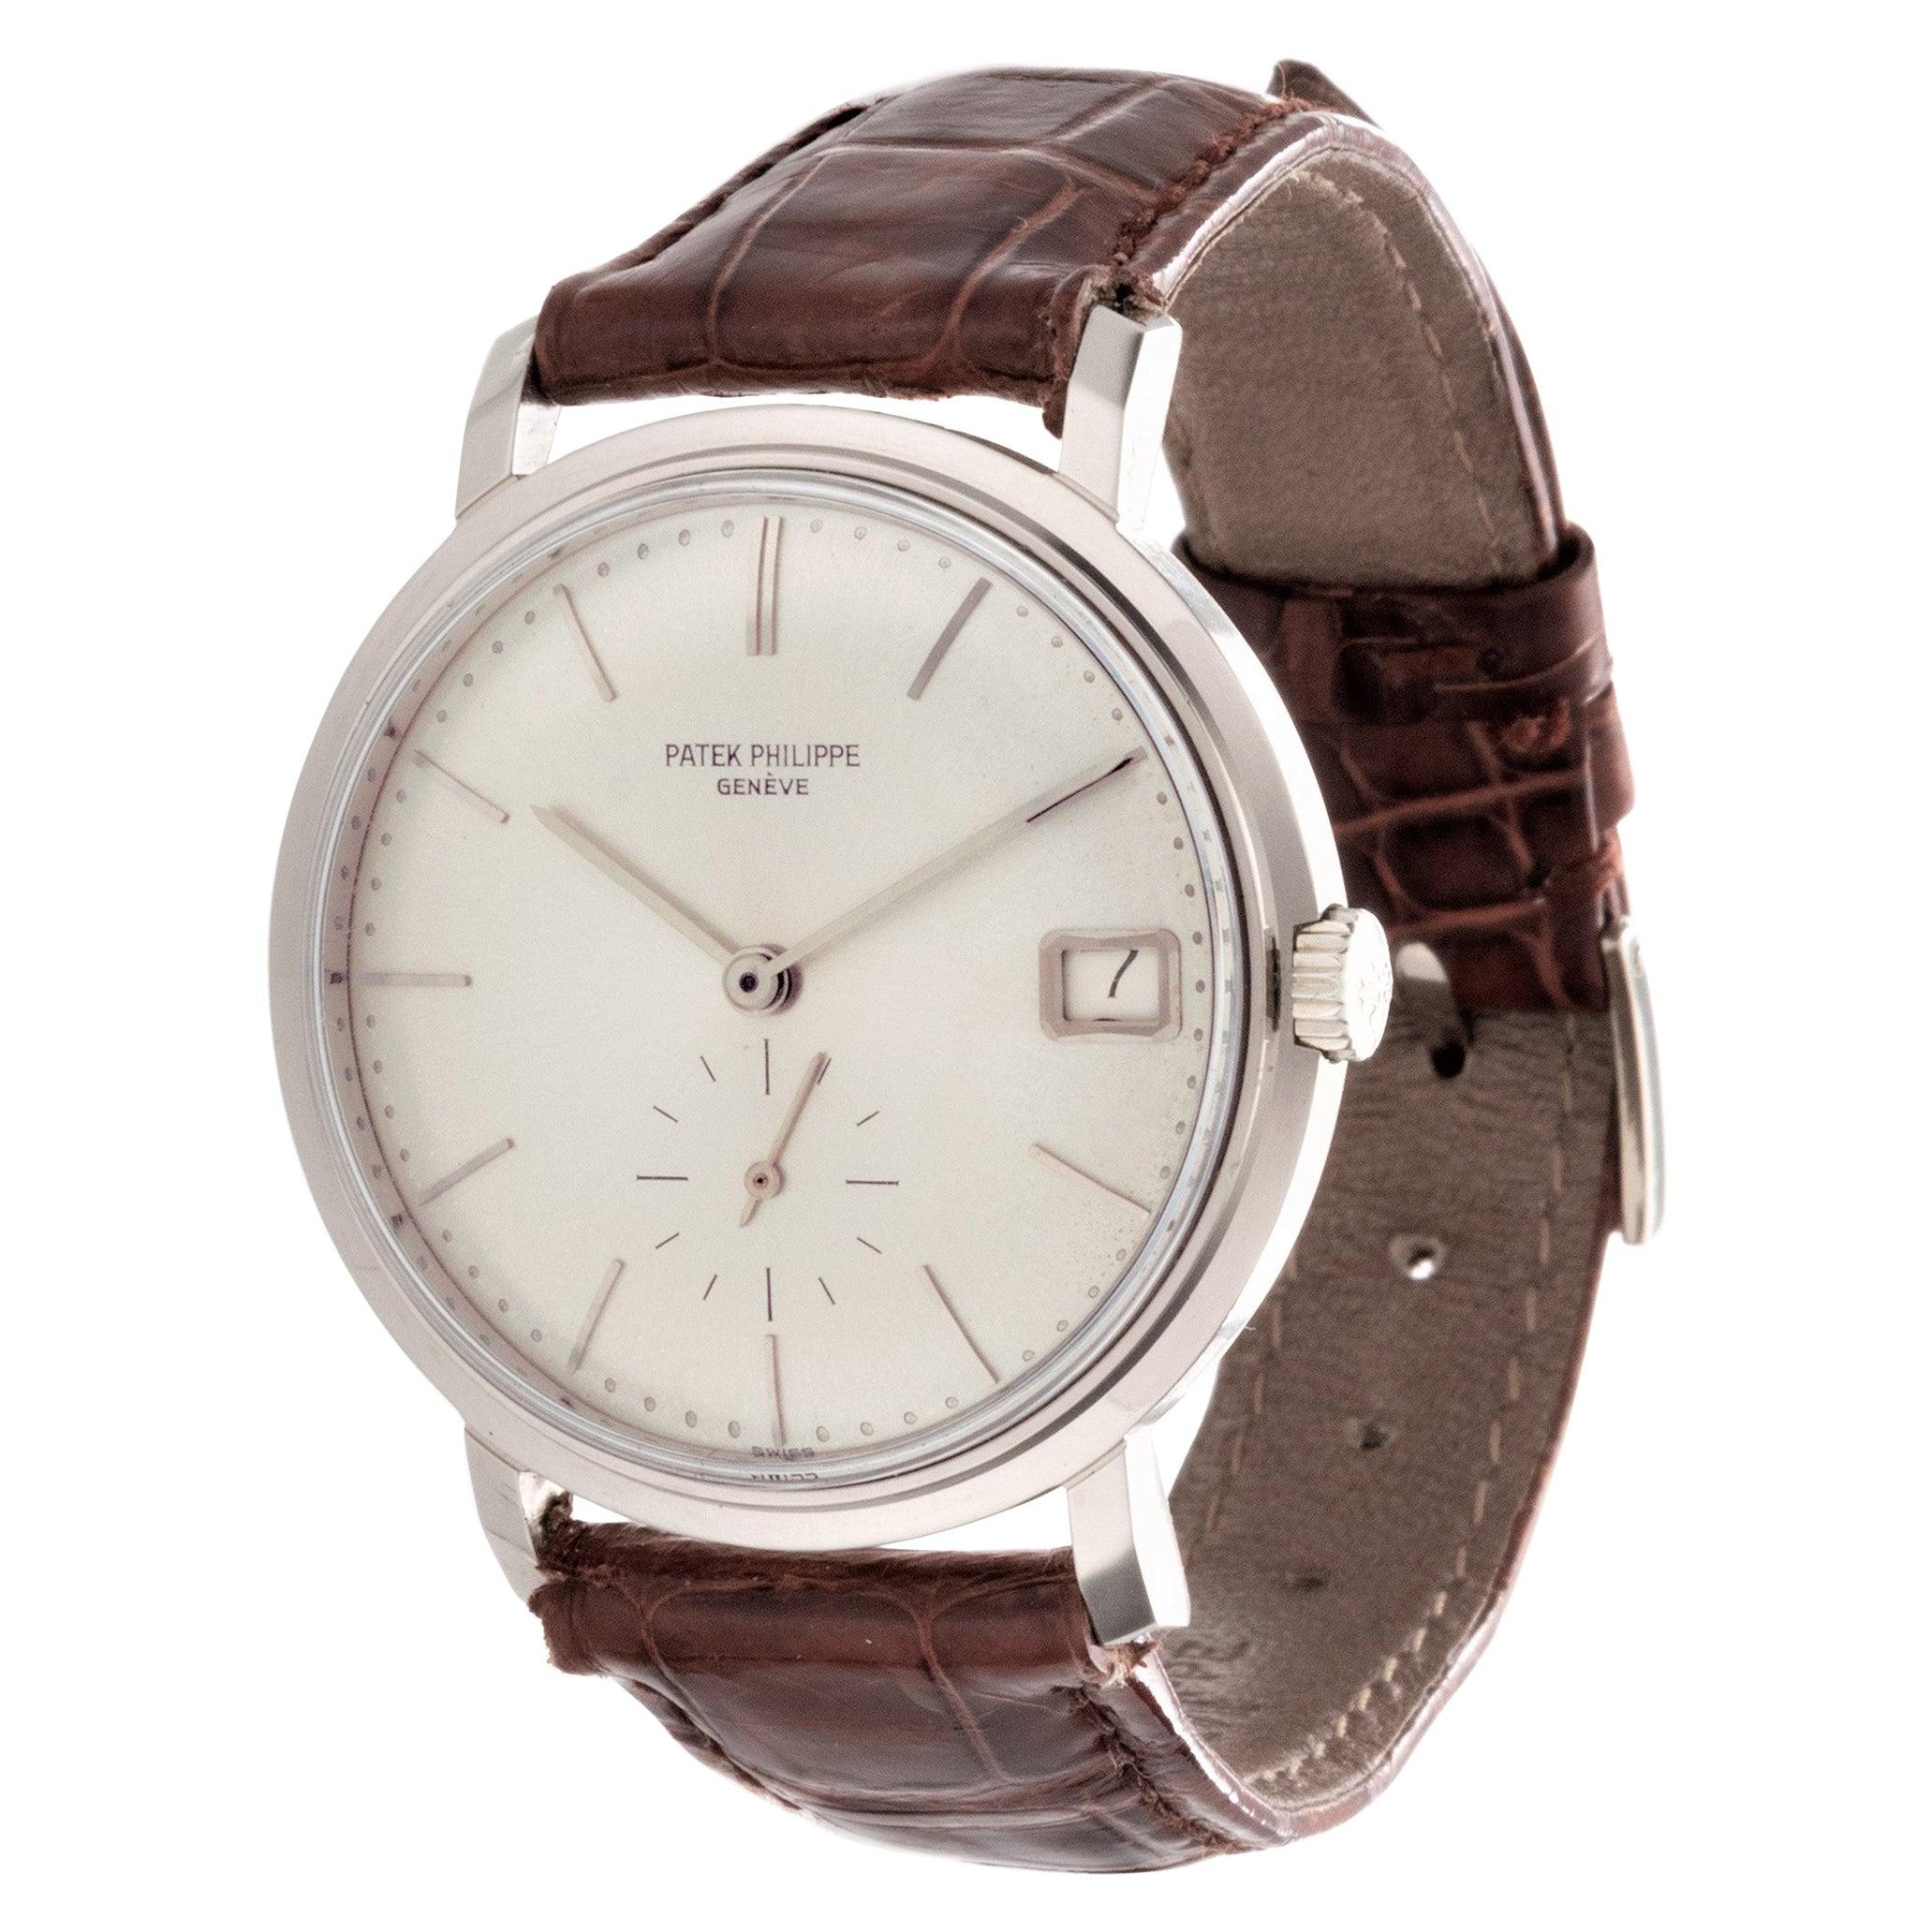 Patek Philippe 3445G Automatic Date Calatrava Watch Circa 1968